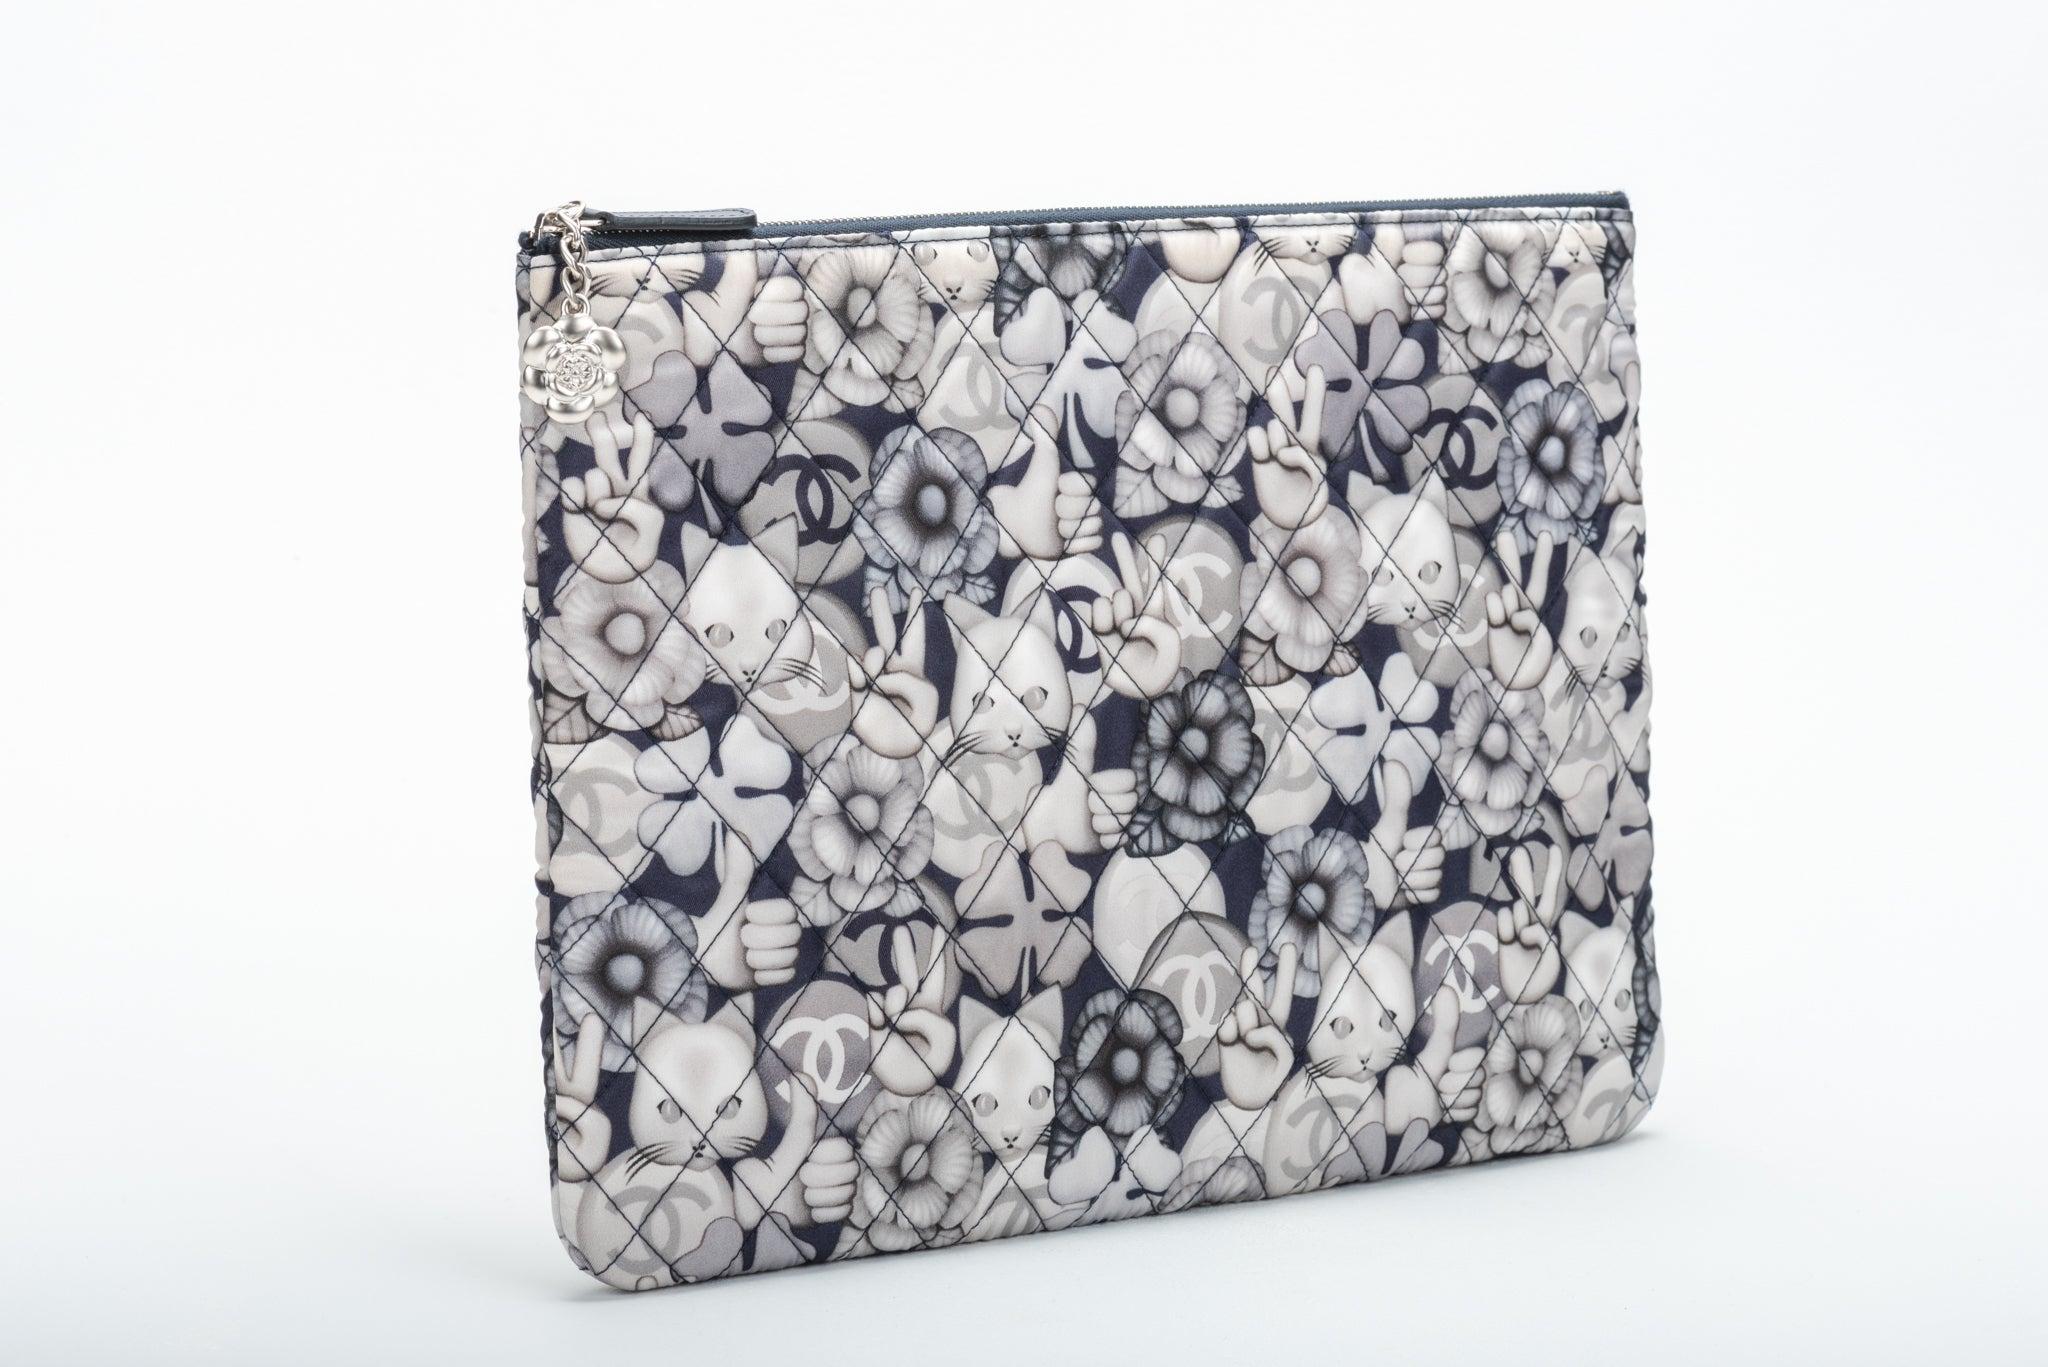 a1a629fee606 New in Box Chanel Grey Nylon Kitty Emoji Clutch at 1stdibs